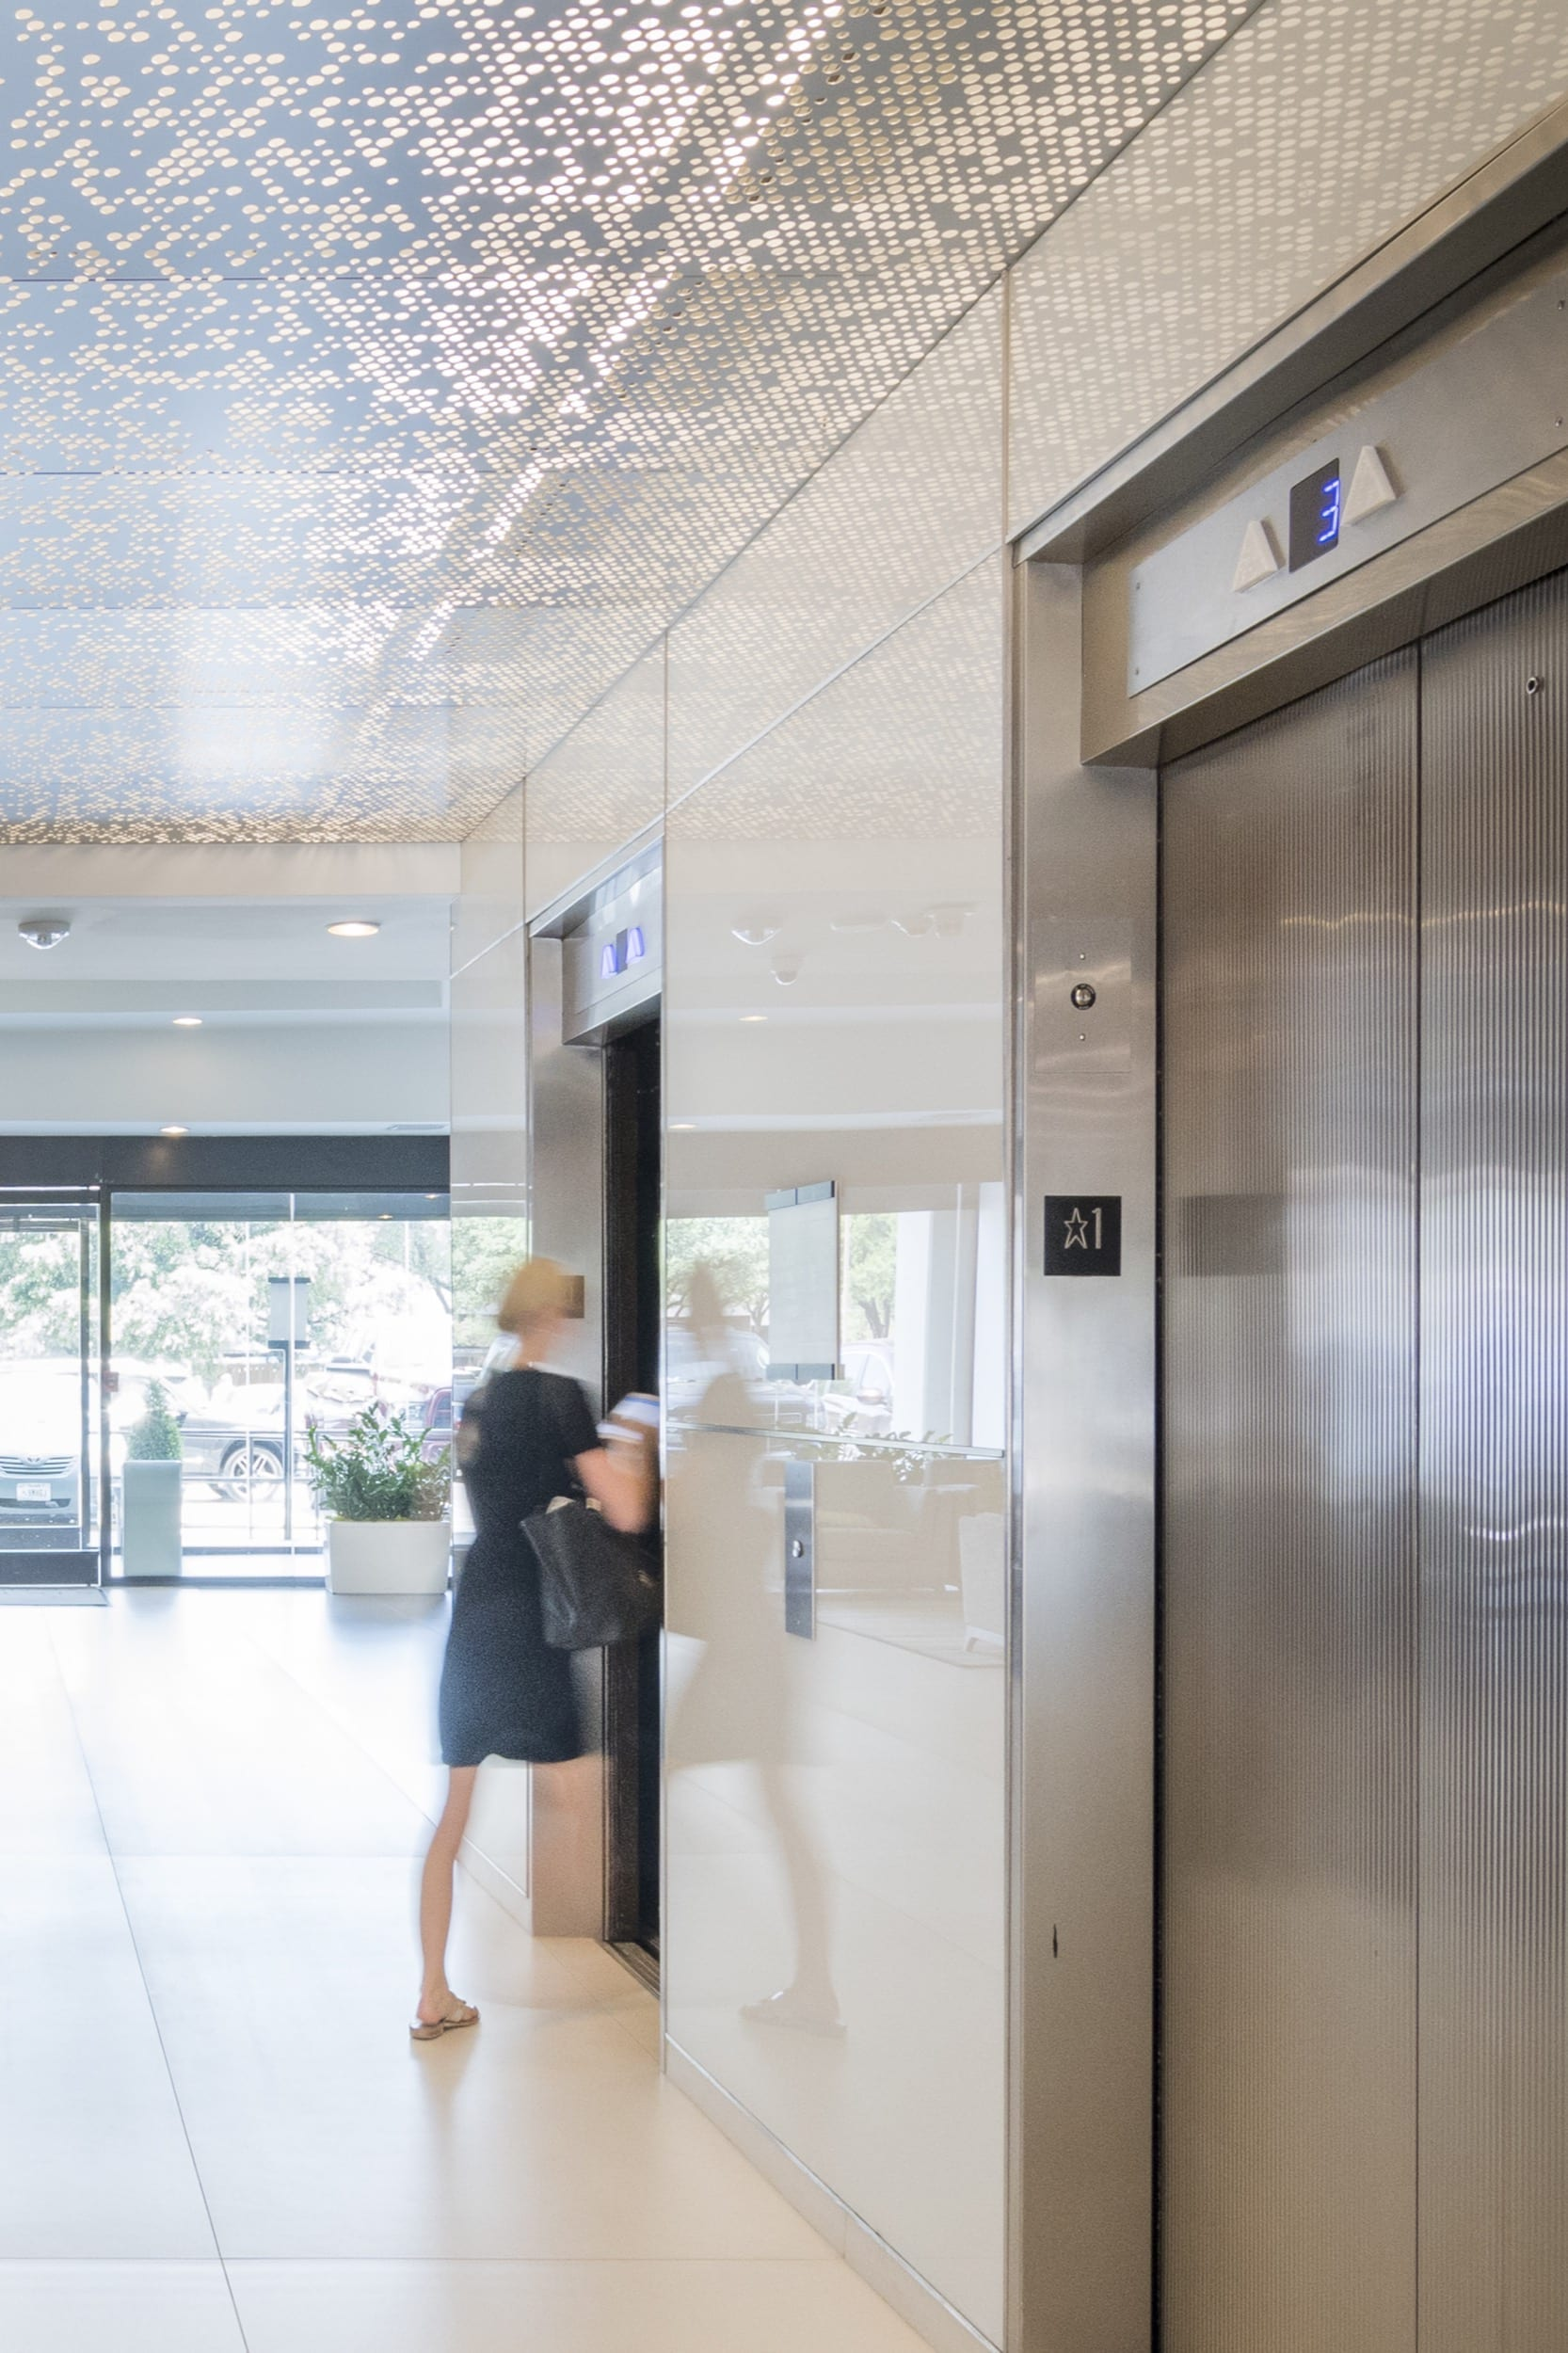 Woman enters an elevator below an ImageWall ceiling.